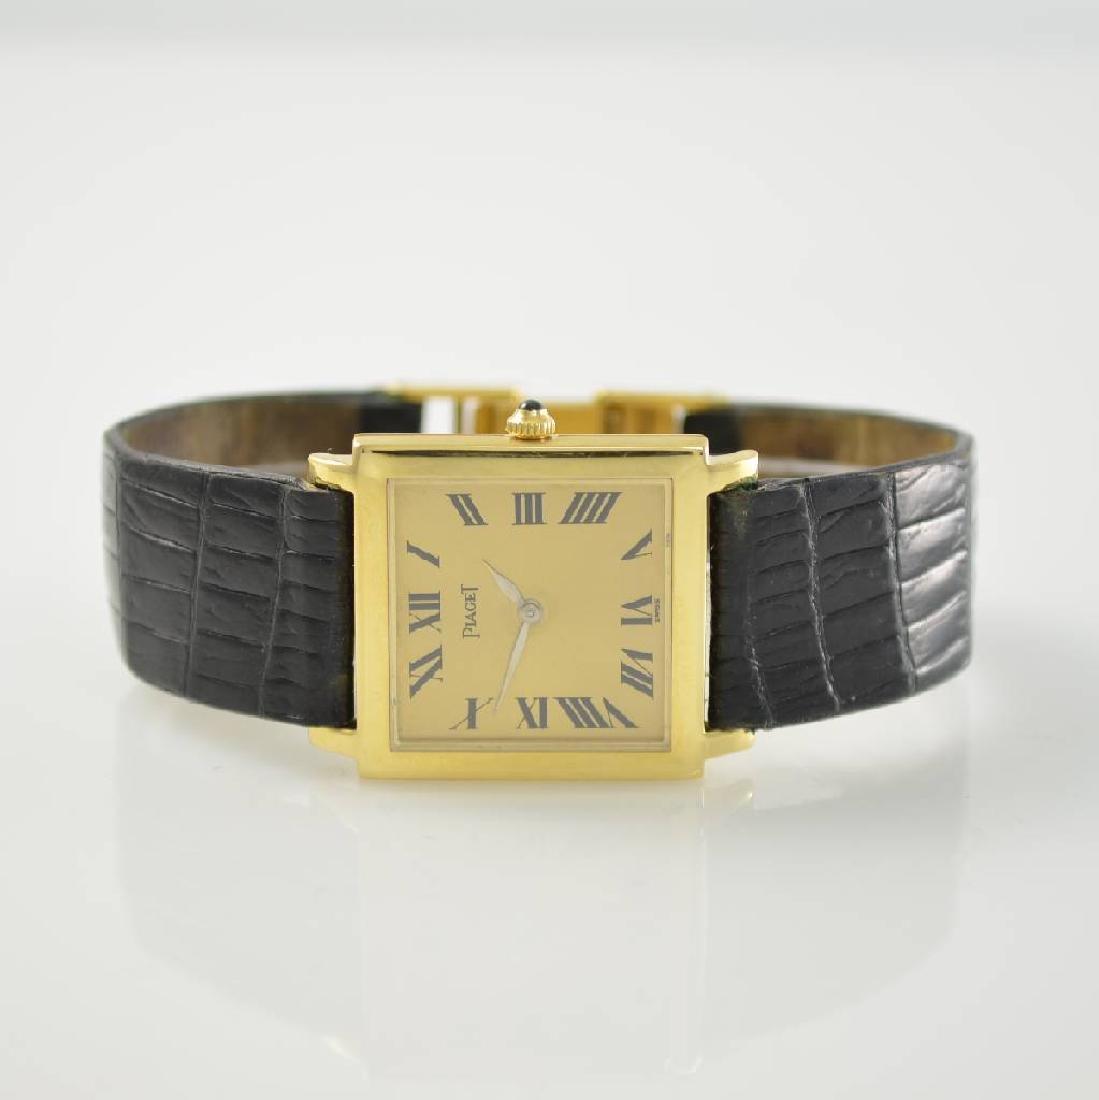 PIAGET very fine 18k yellow gold wristwatch